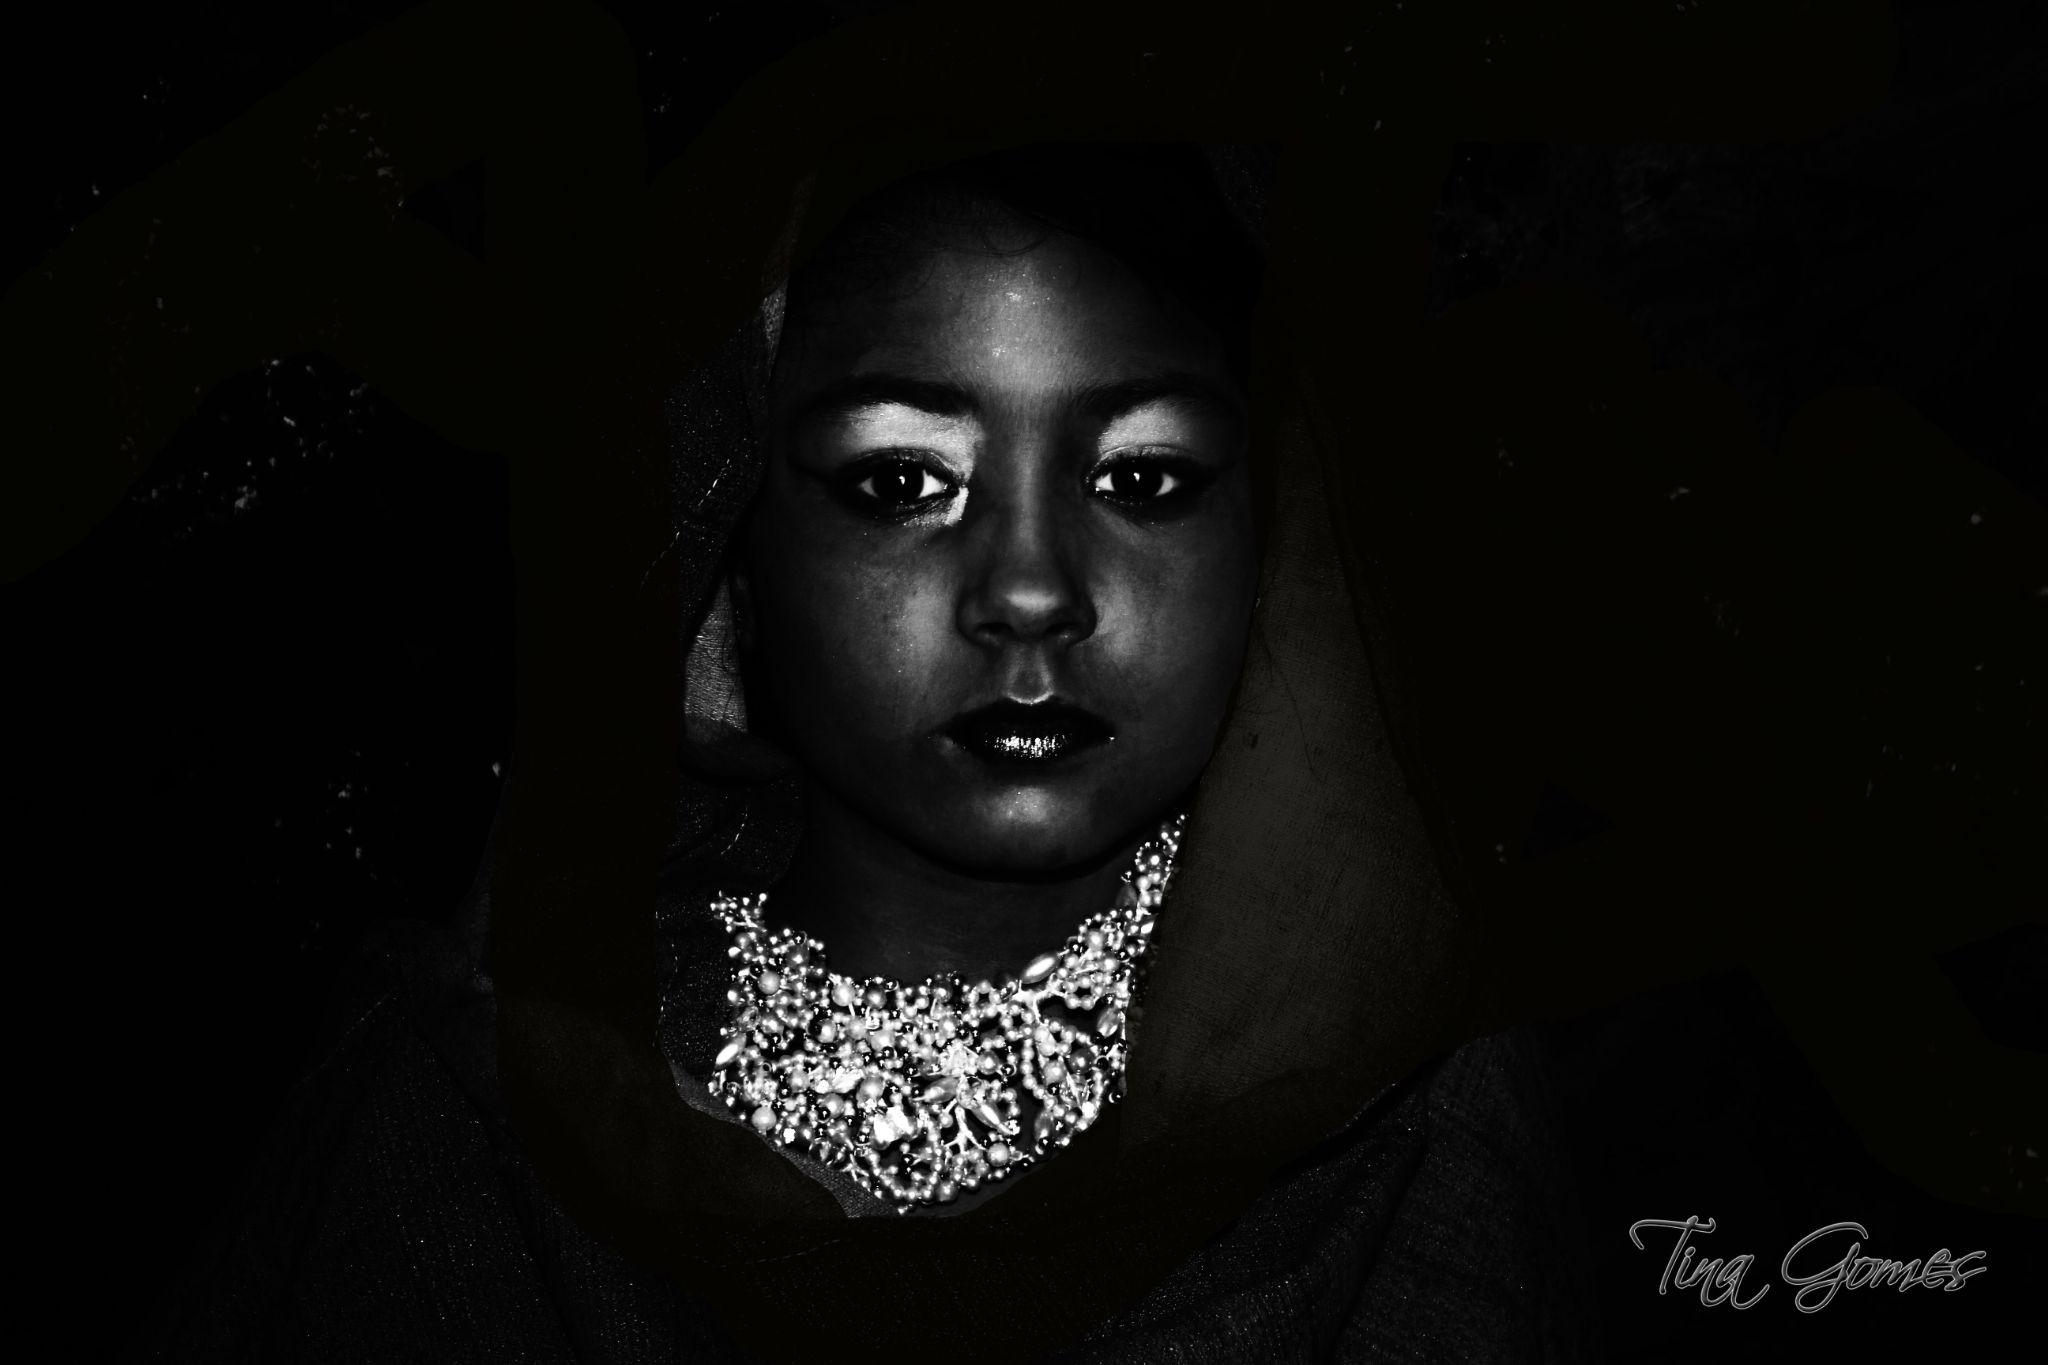 IMG_7166 by Tininha Gomes